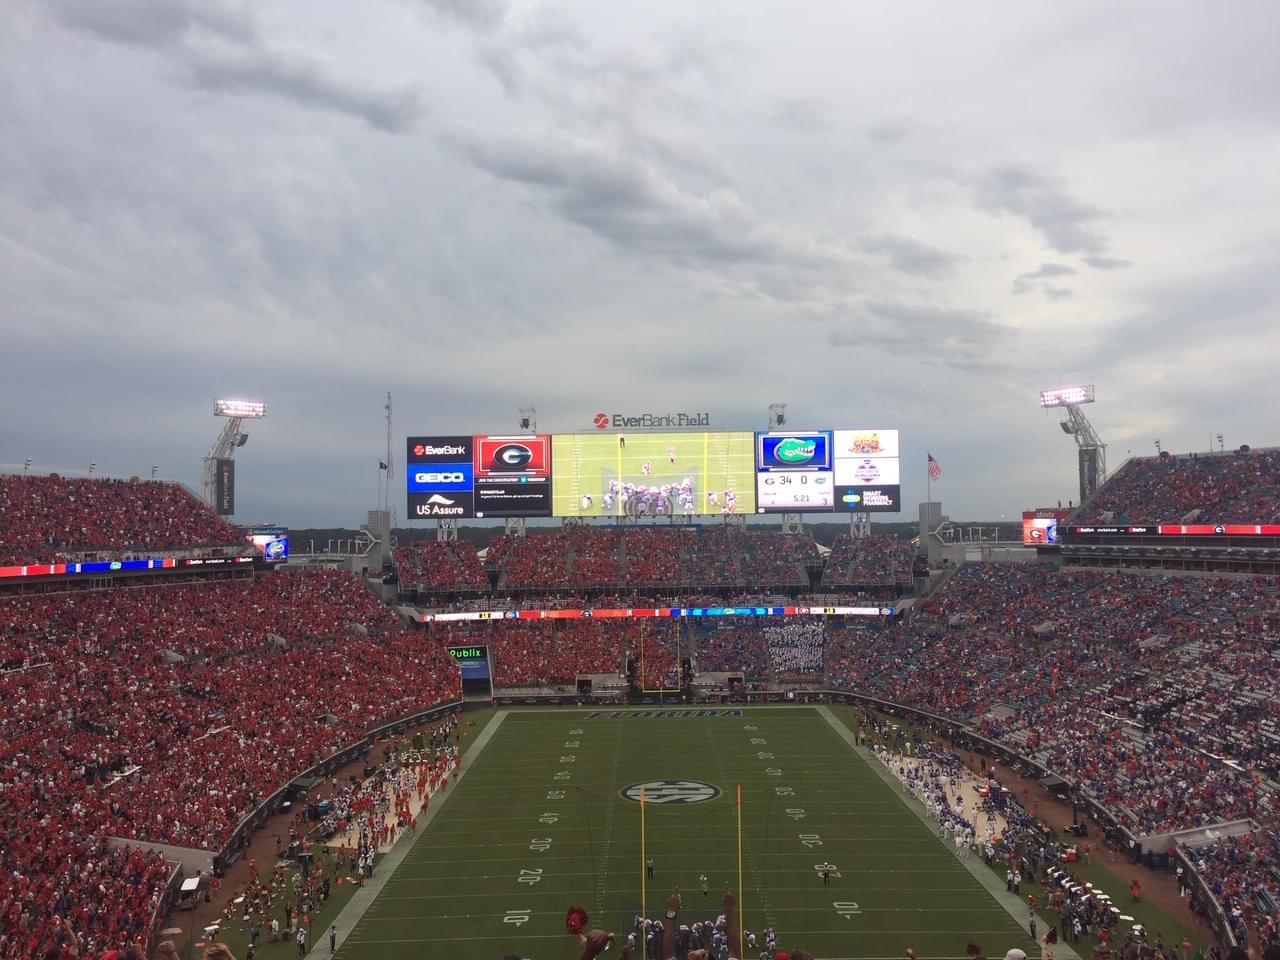 LAMM AT LARGE: Florida-Georgia Game Adds New Twists